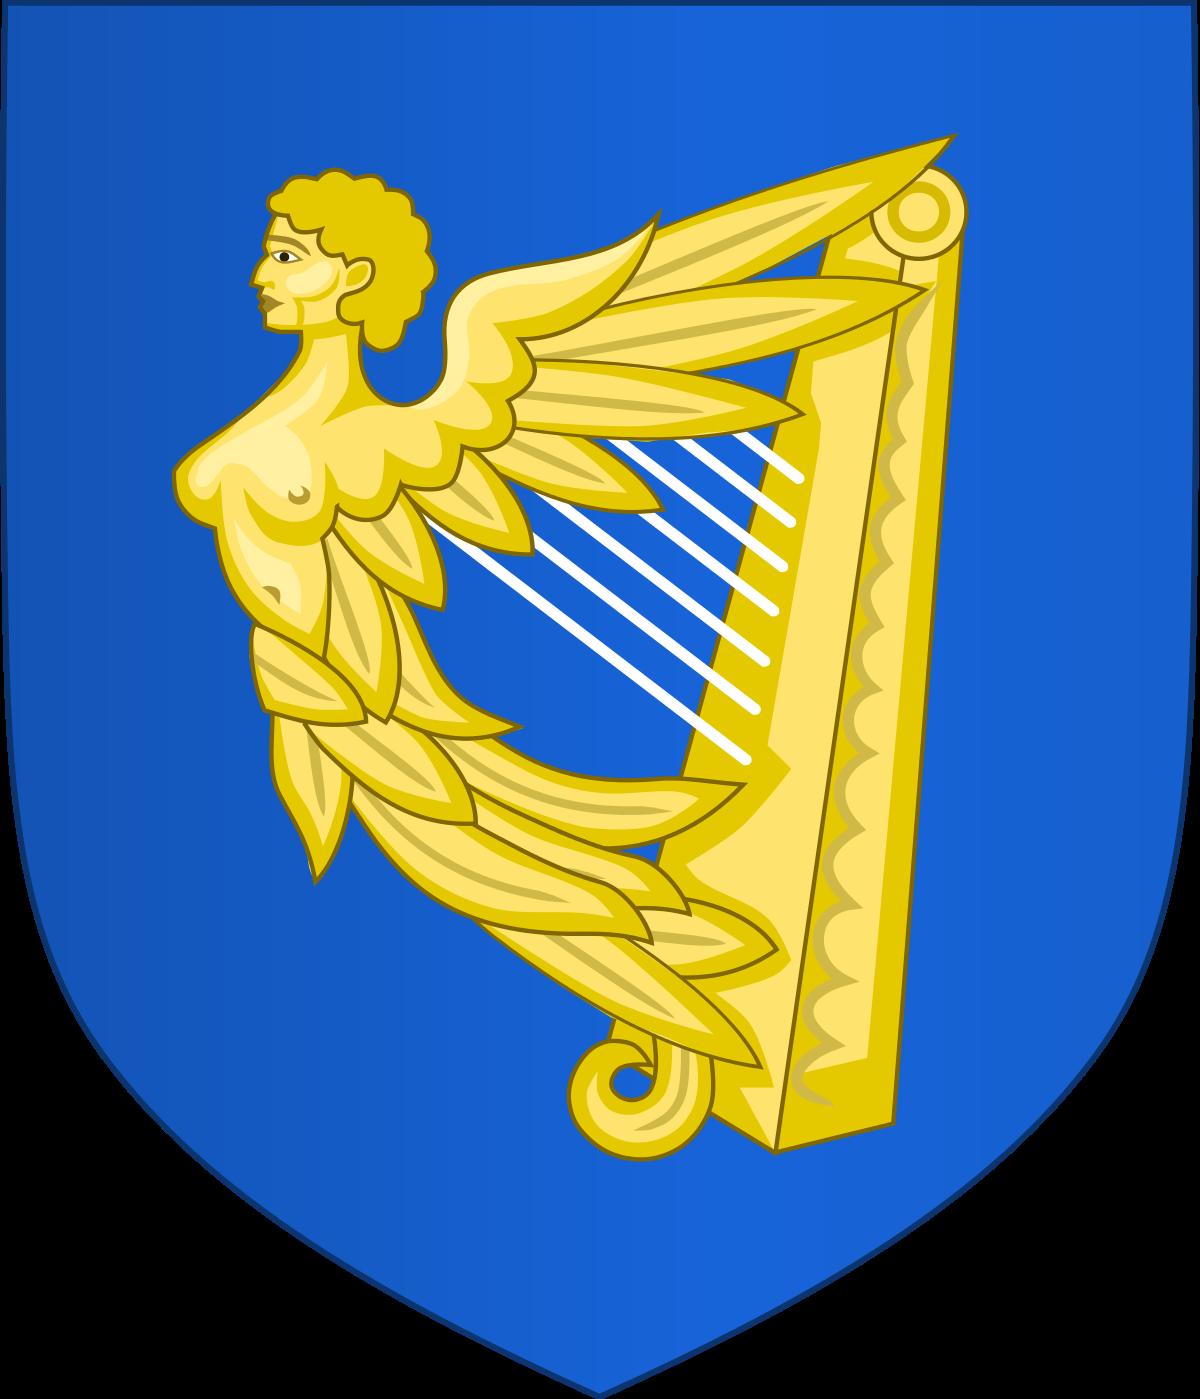 Parliament of Ireland.